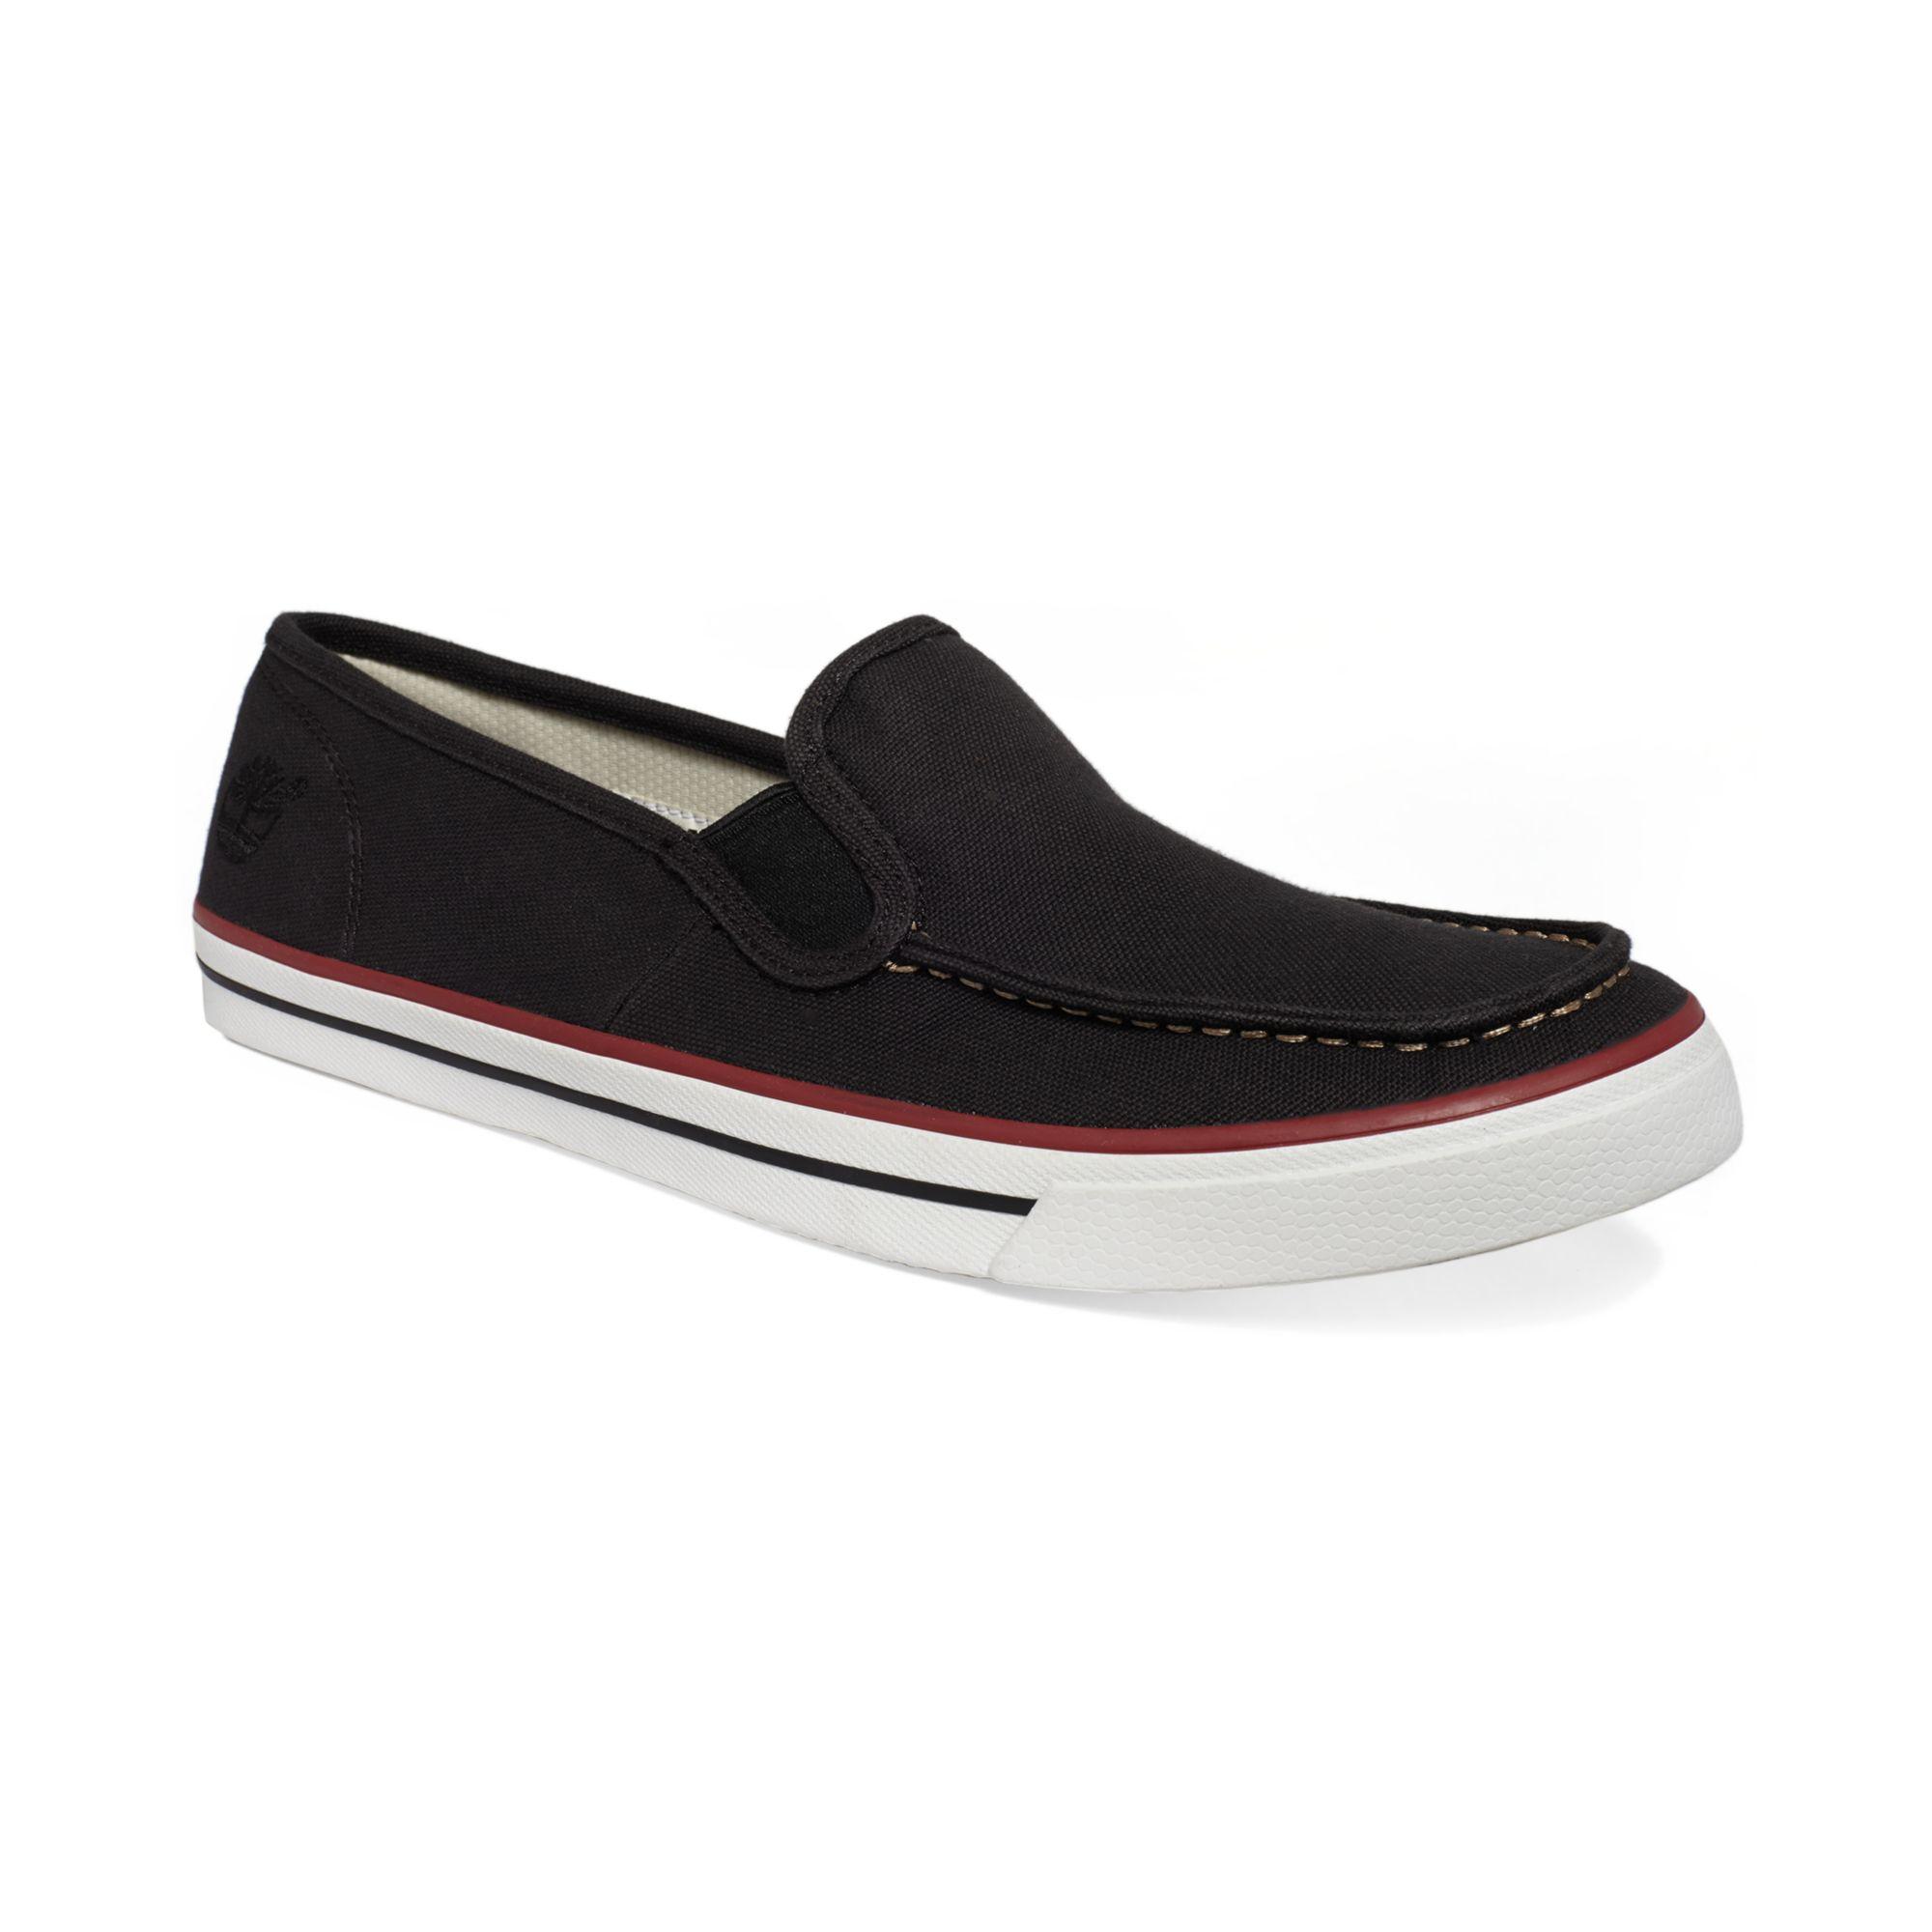 timberland hookset slipon boat shoe sneakers in black for